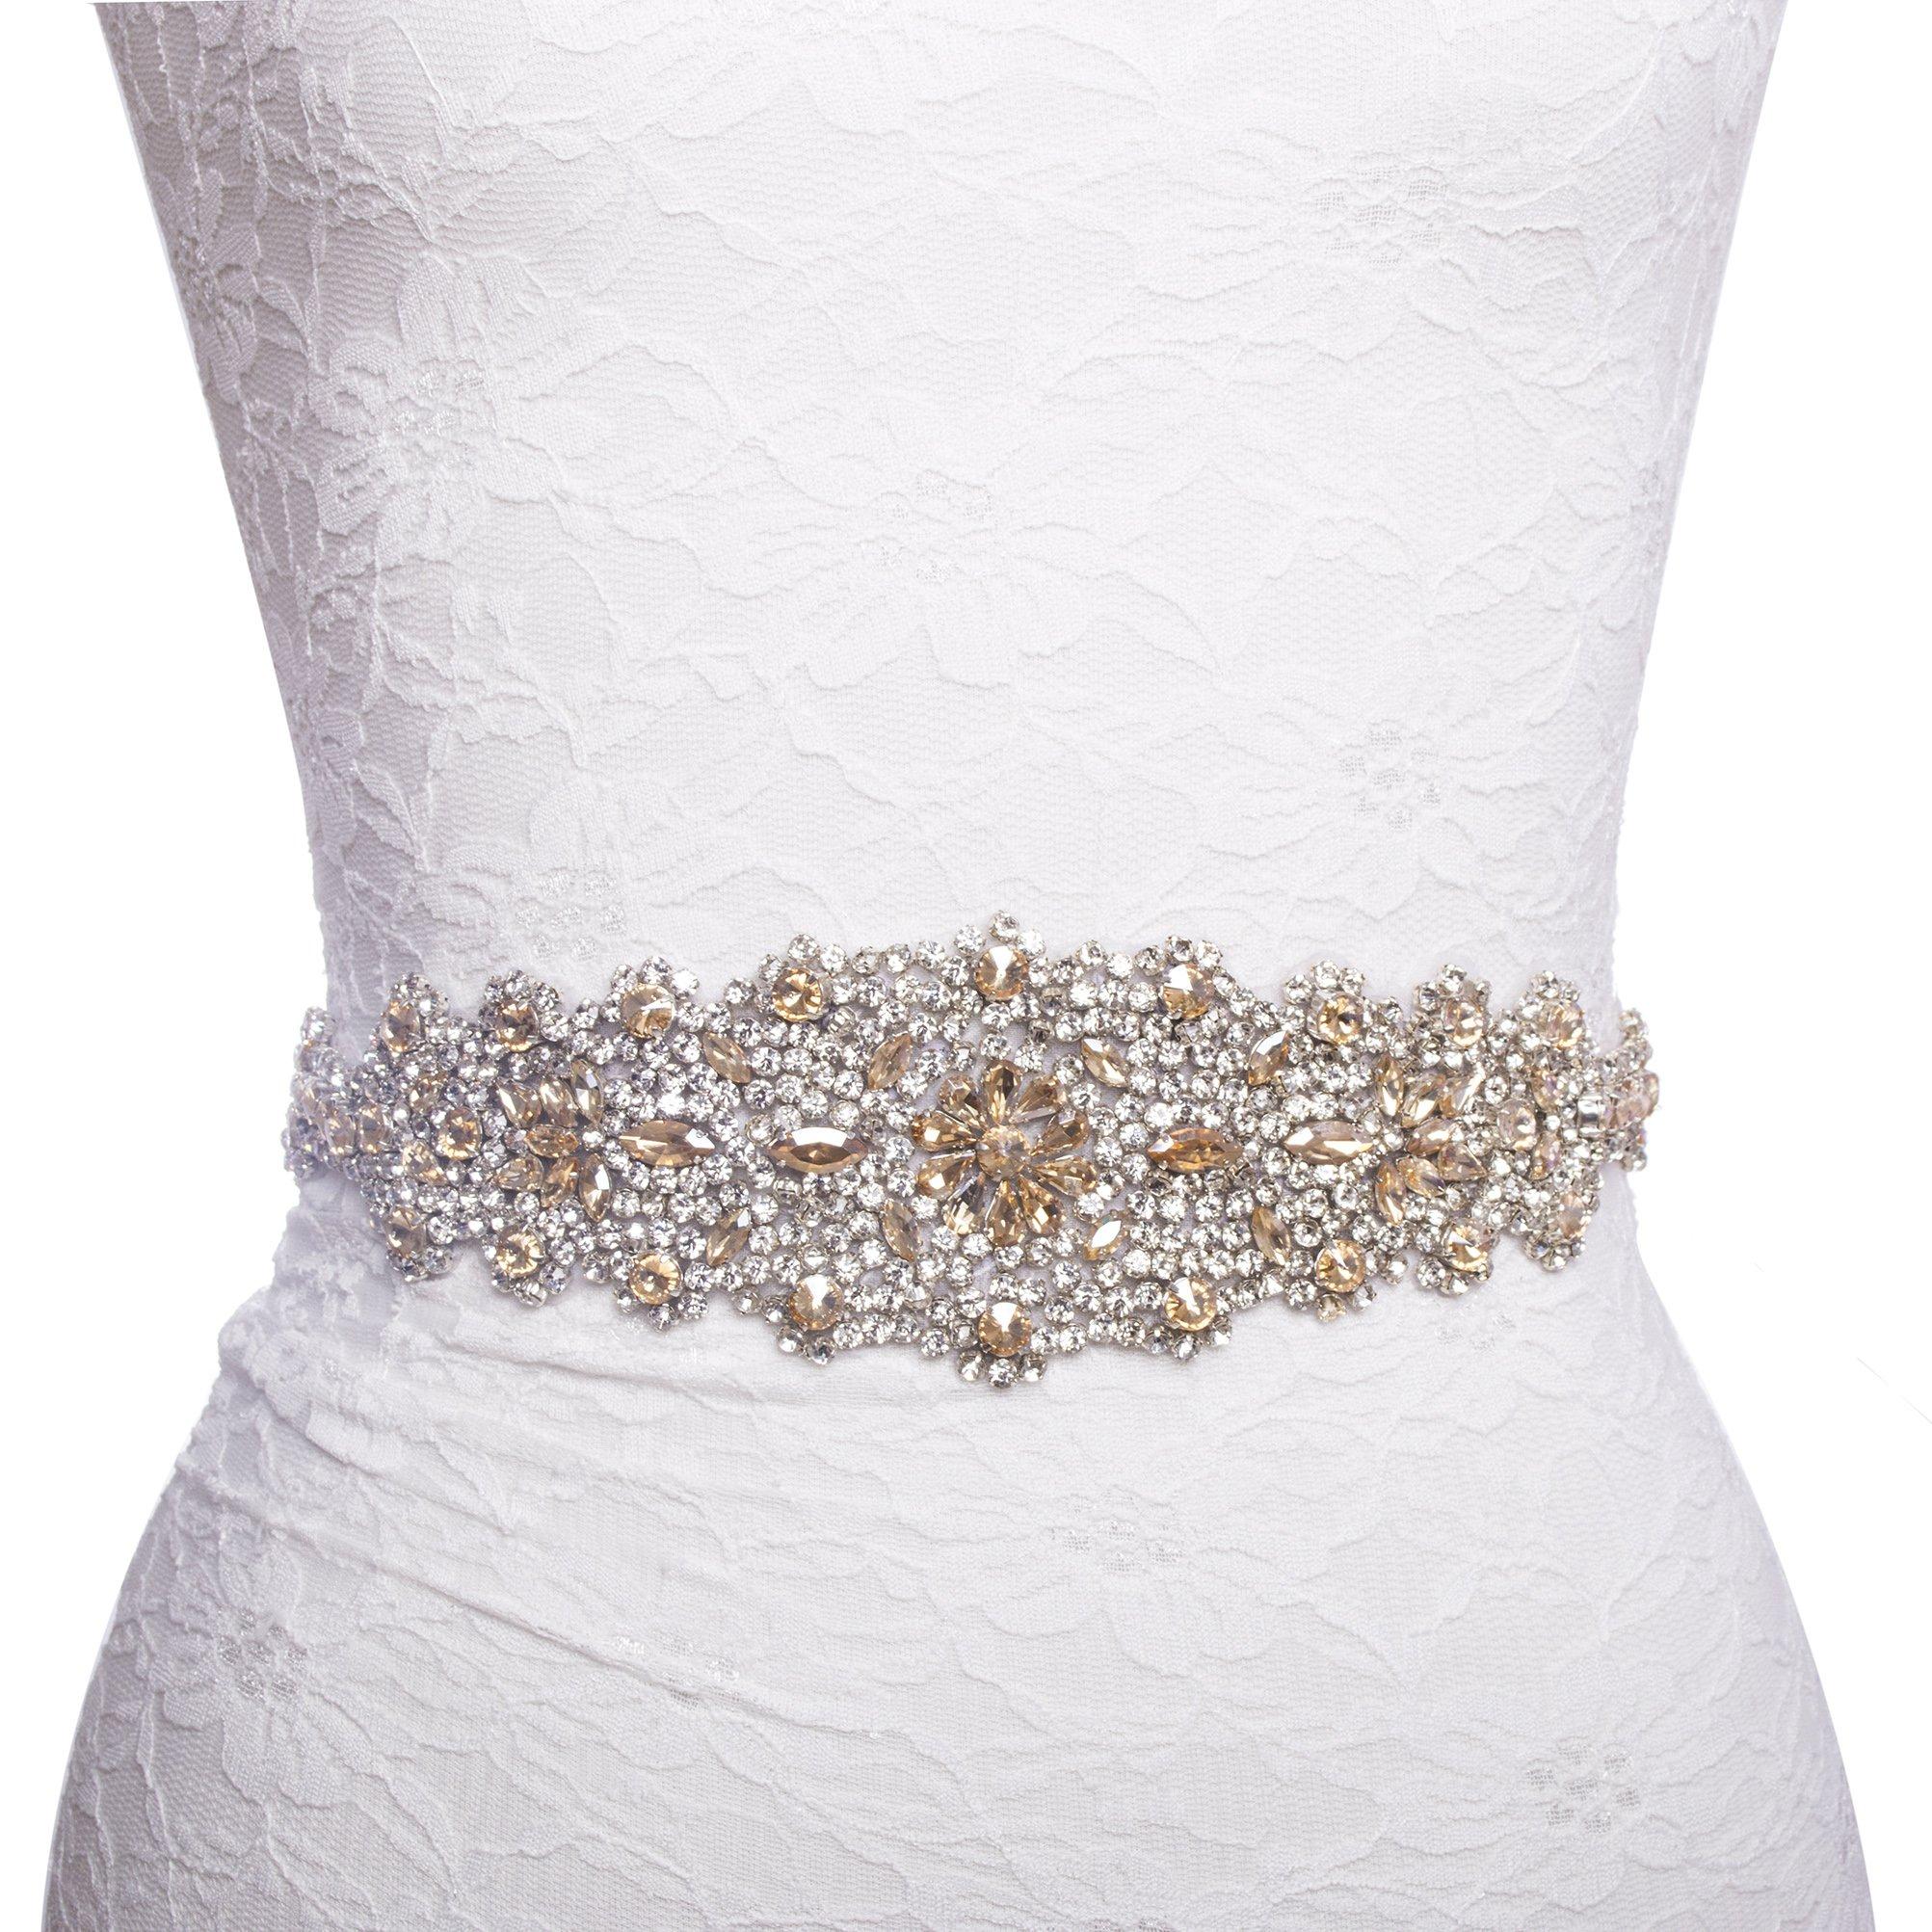 Redowa Wide Champagne Rhinestone Pearl Wedding Dress Bridal Sash Belt